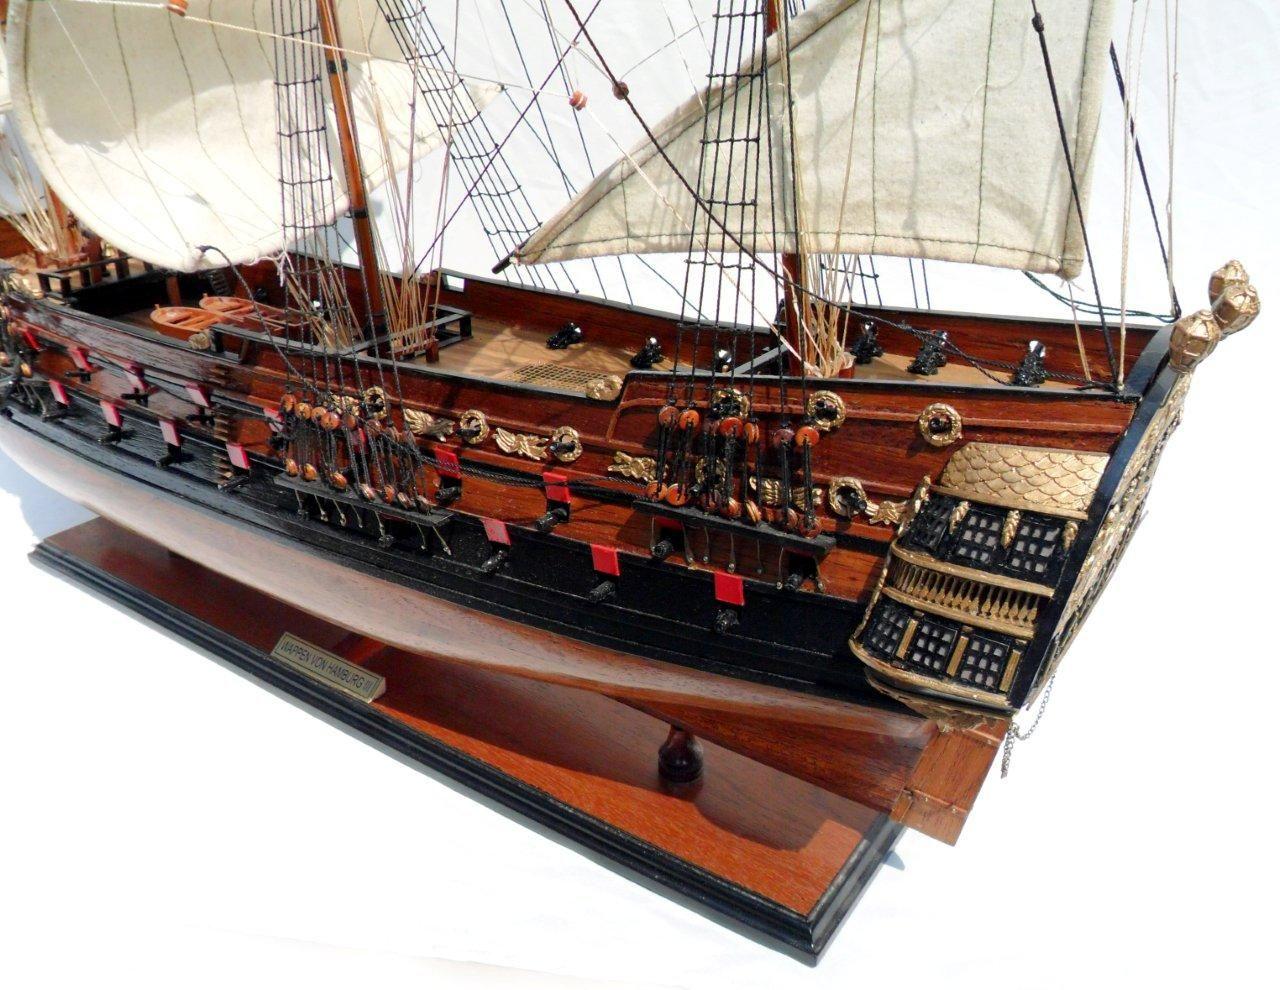 1996-12612-Wapen-von-Hamburg-III-Model-ship